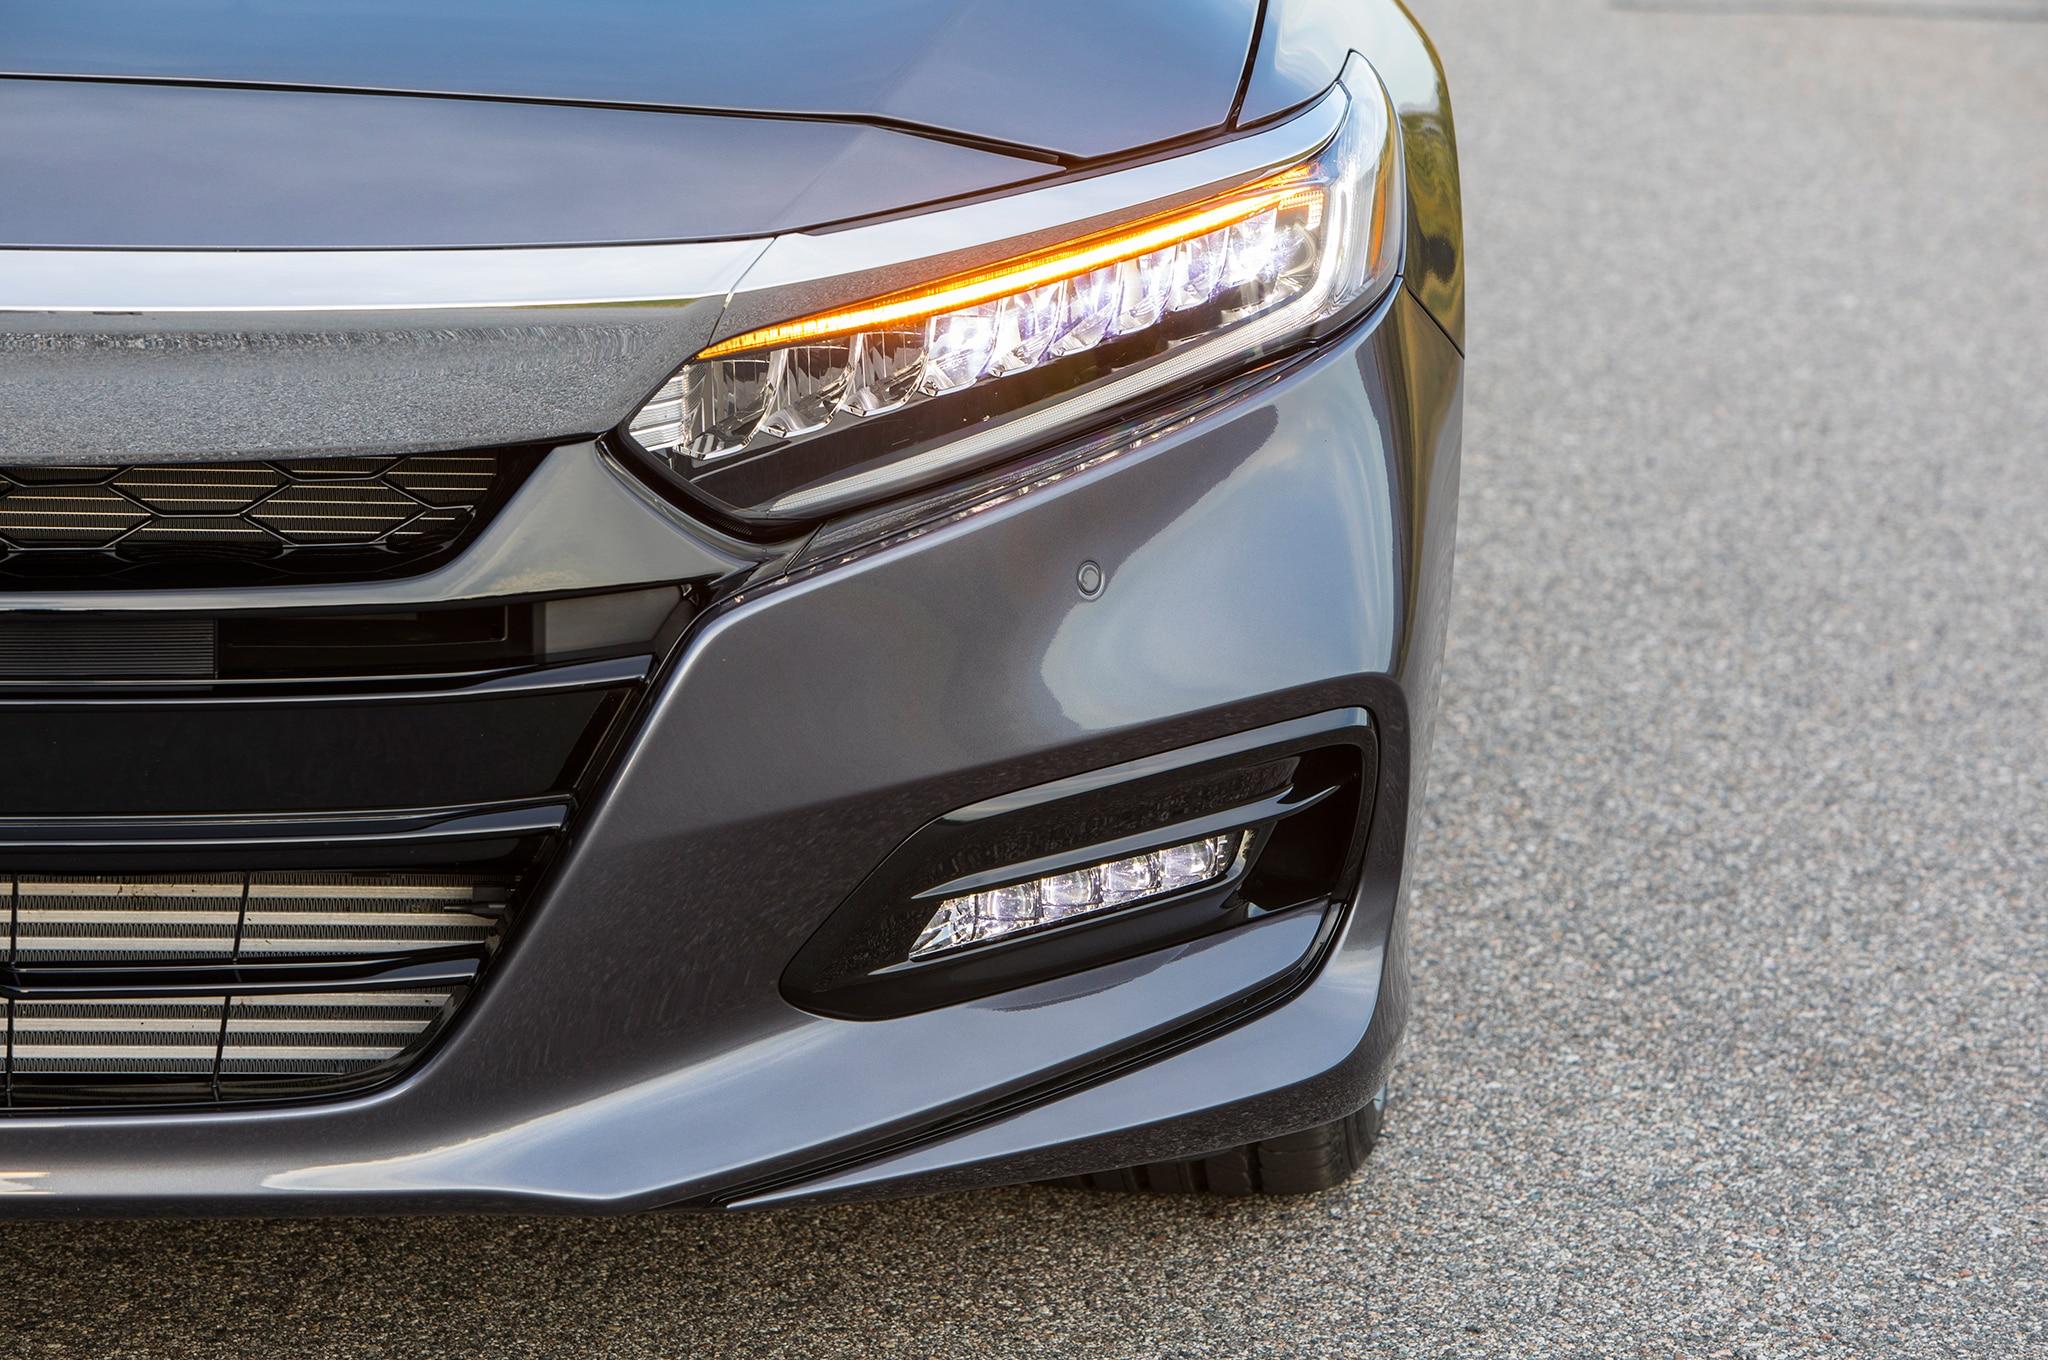 2018 Honda Accord Touring 2 0t Headlight 29 Septiembre 2017 Erika Pizano